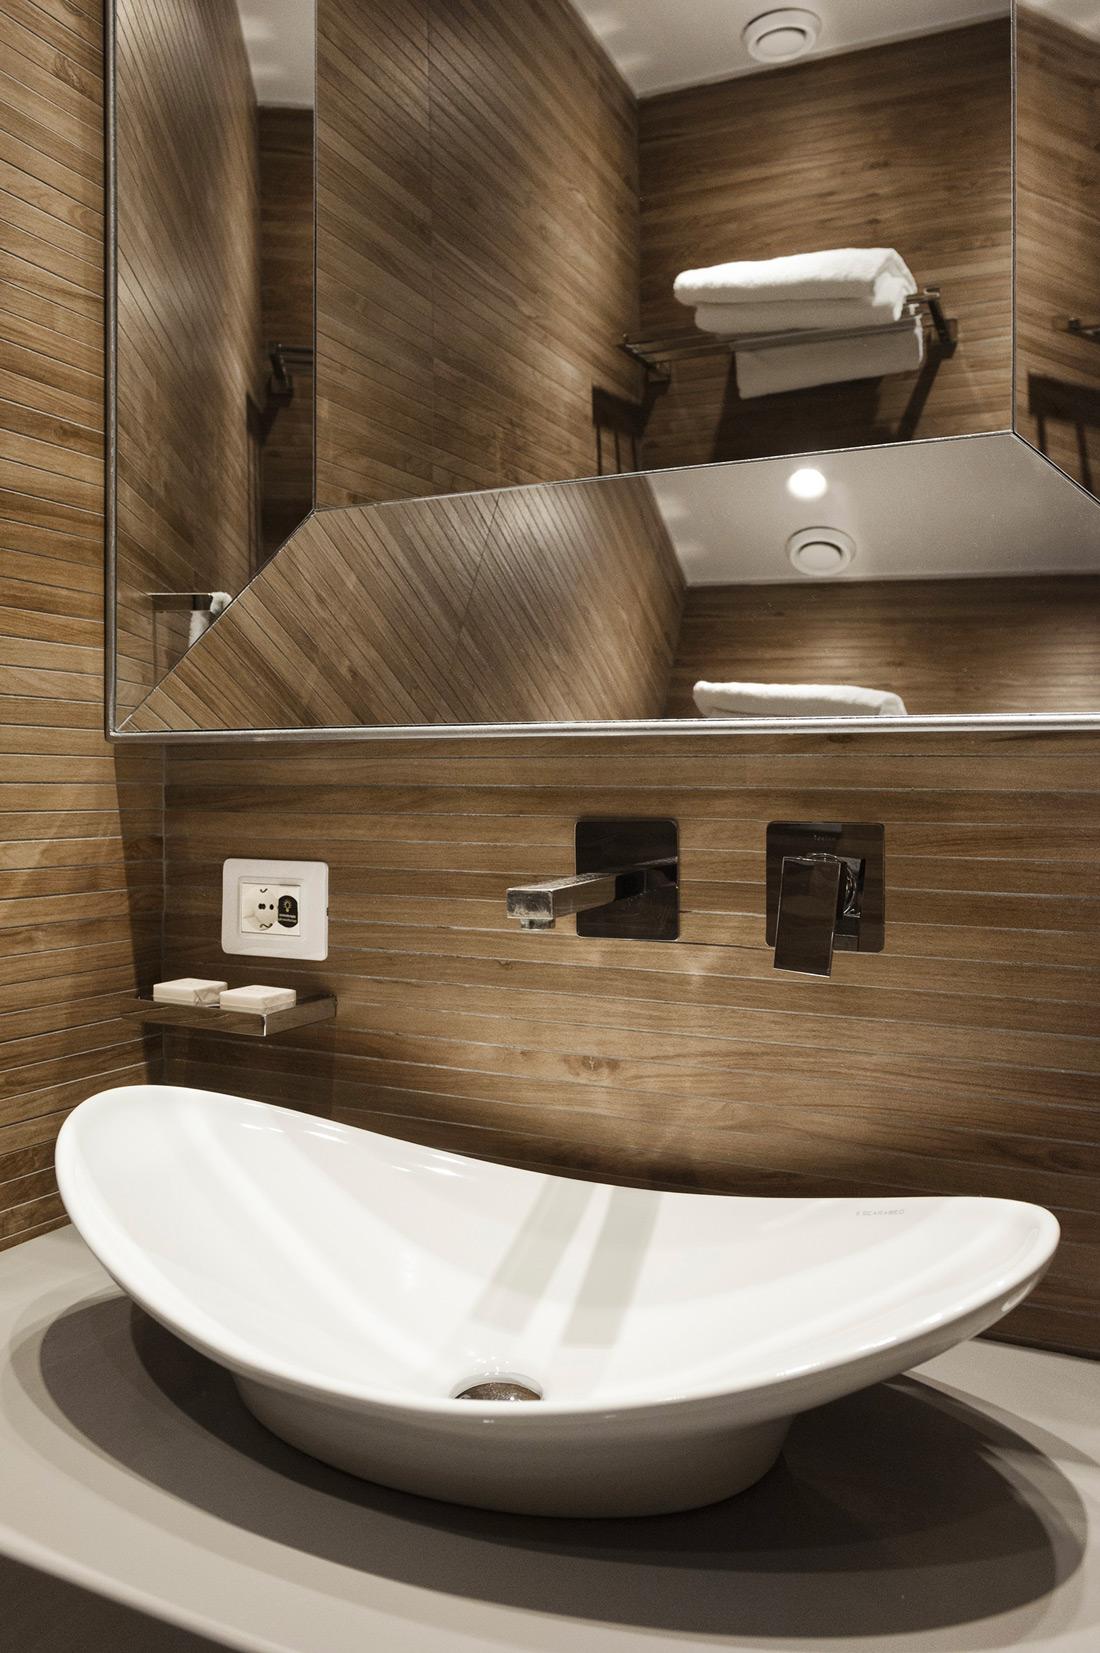 Presa elettrica da bagno hotel AVE - Torre Argentina Relais